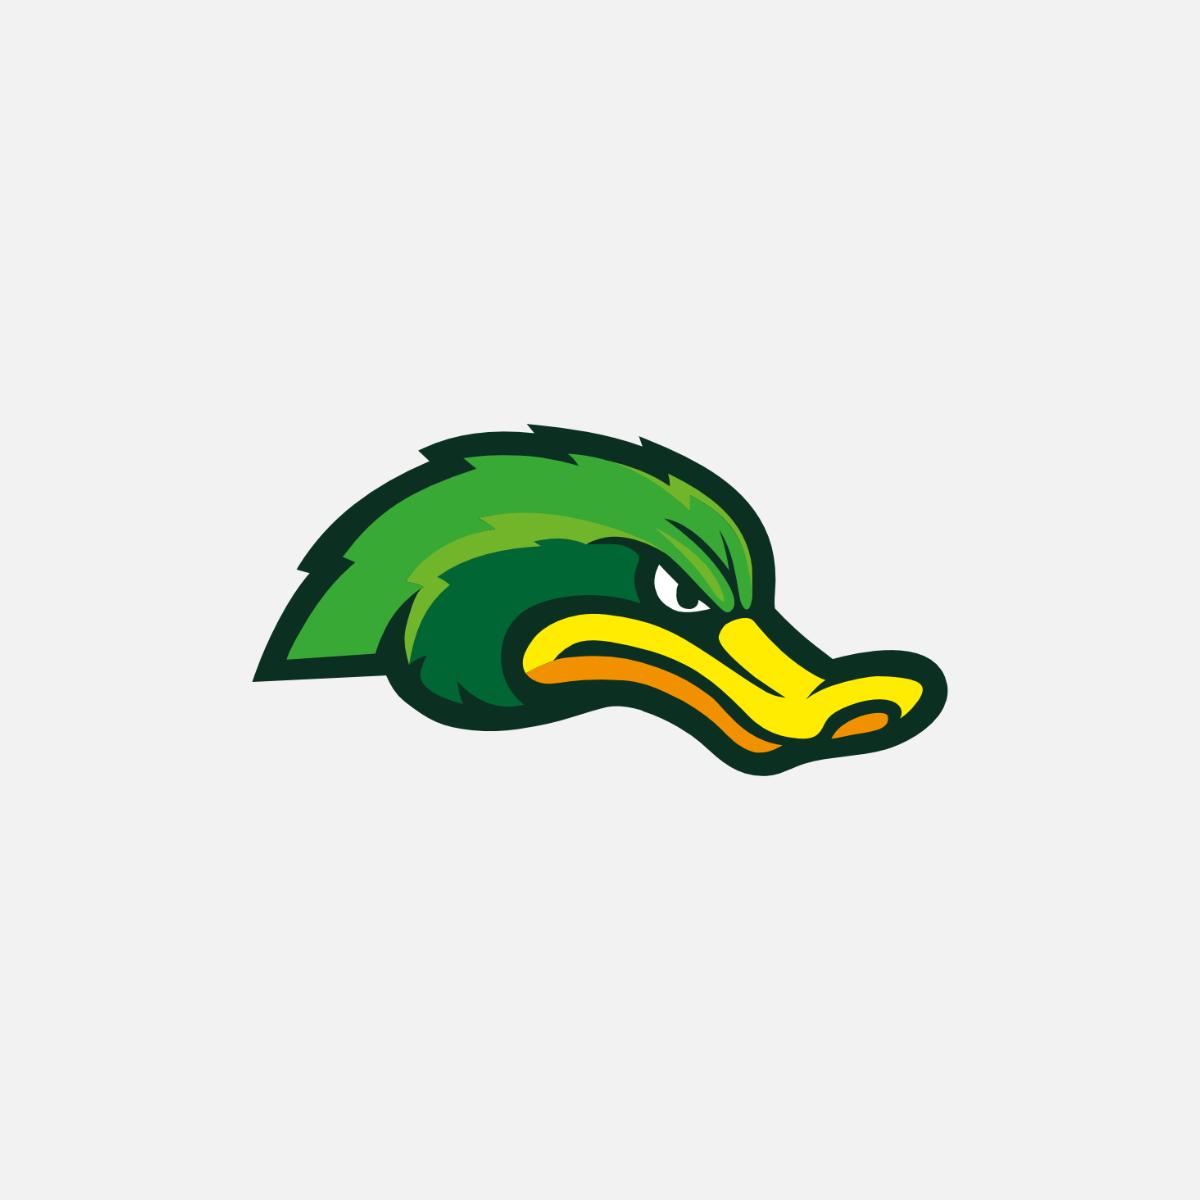 Green Ducks sygnet marki